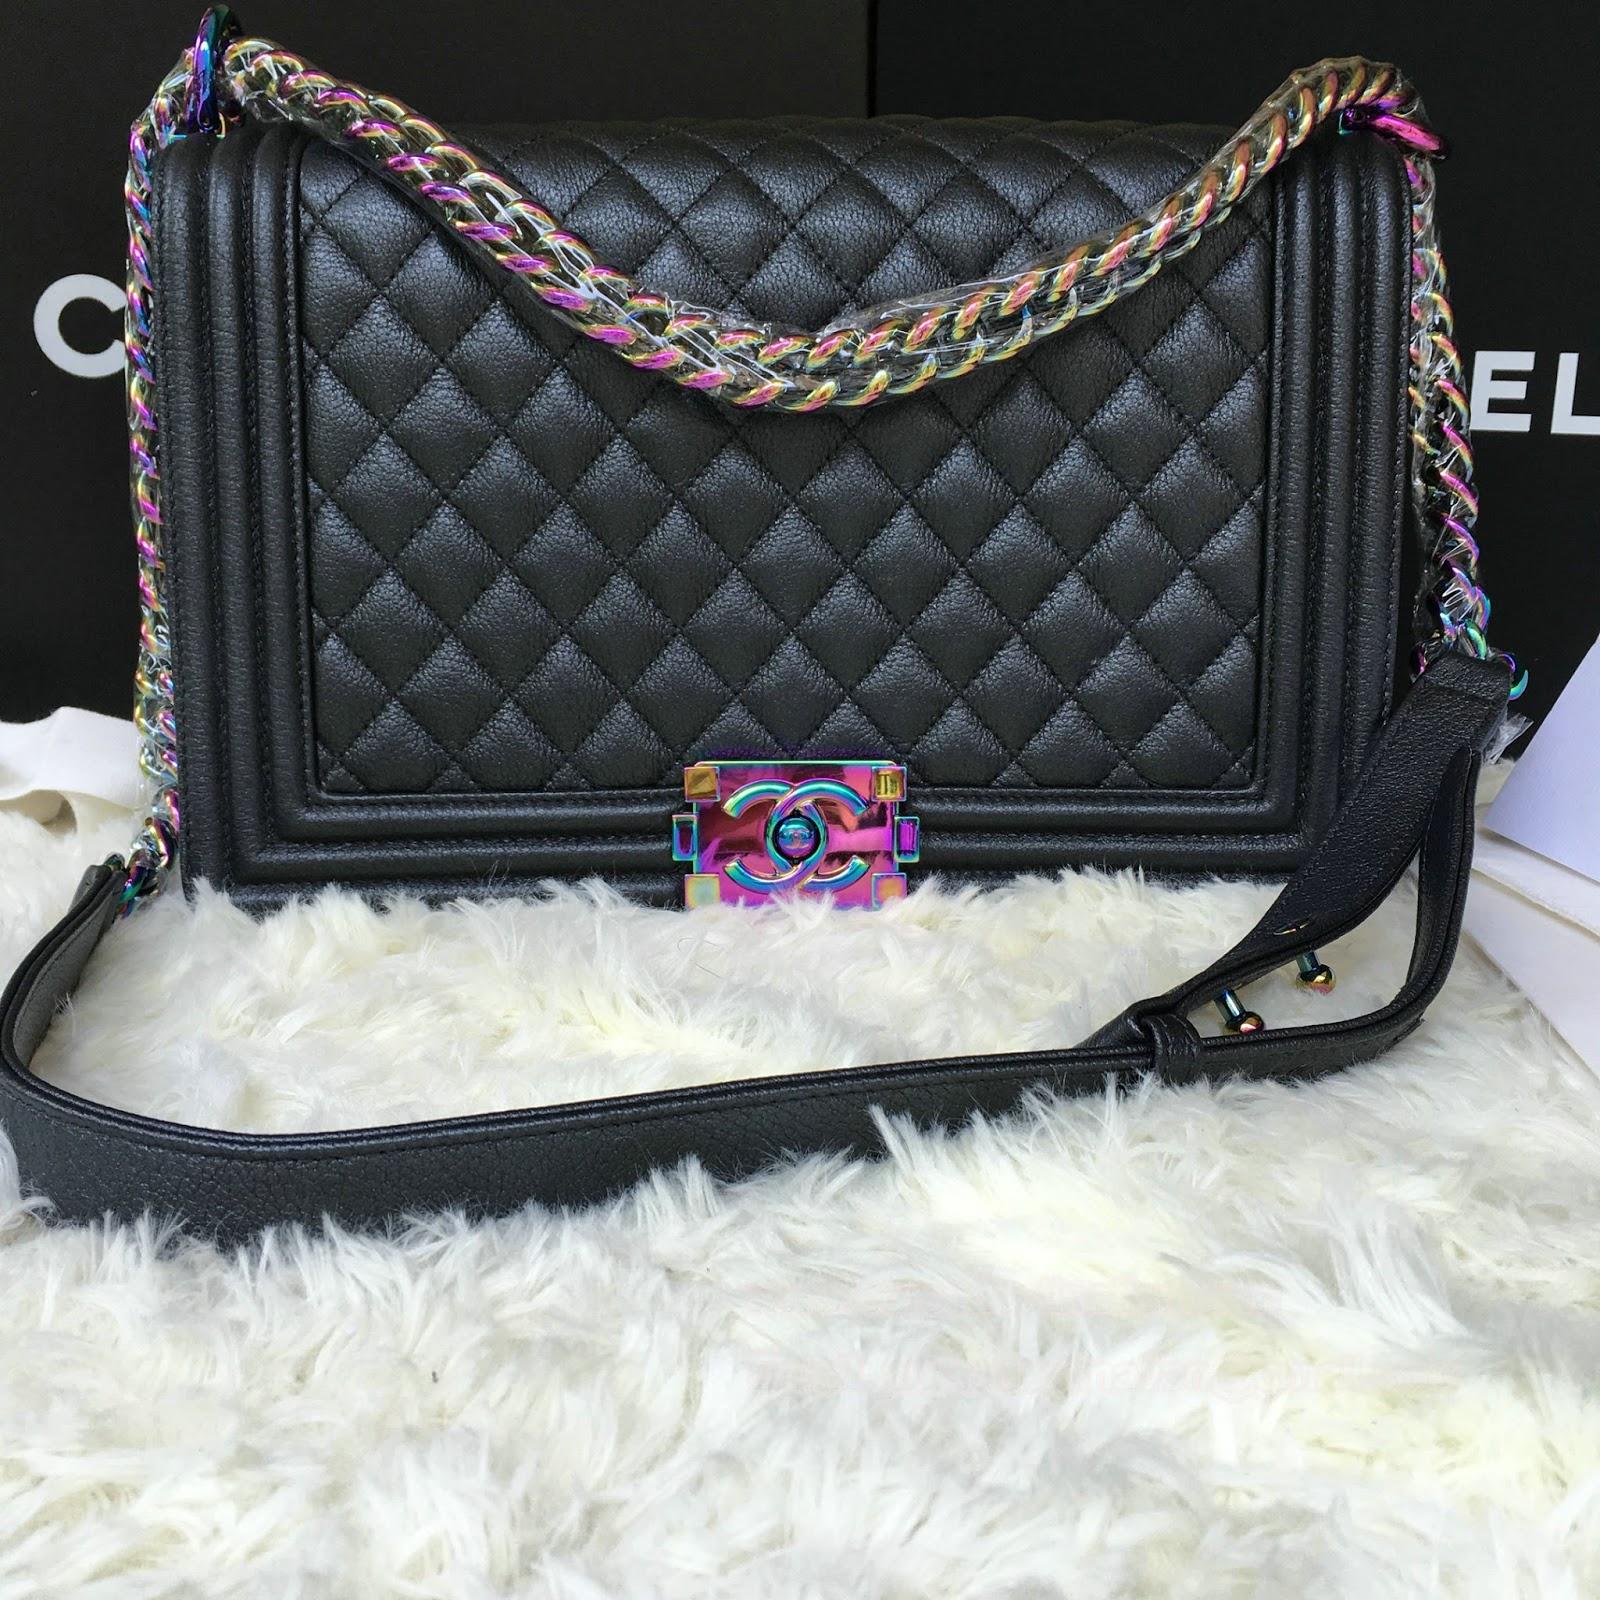 487c5777eb0b02 Chanel Le boy 28cm Classic Flap with Colorful Lock Best Original Quality  Pre shipment photos | Pursedestination Replica Bags Real Photos